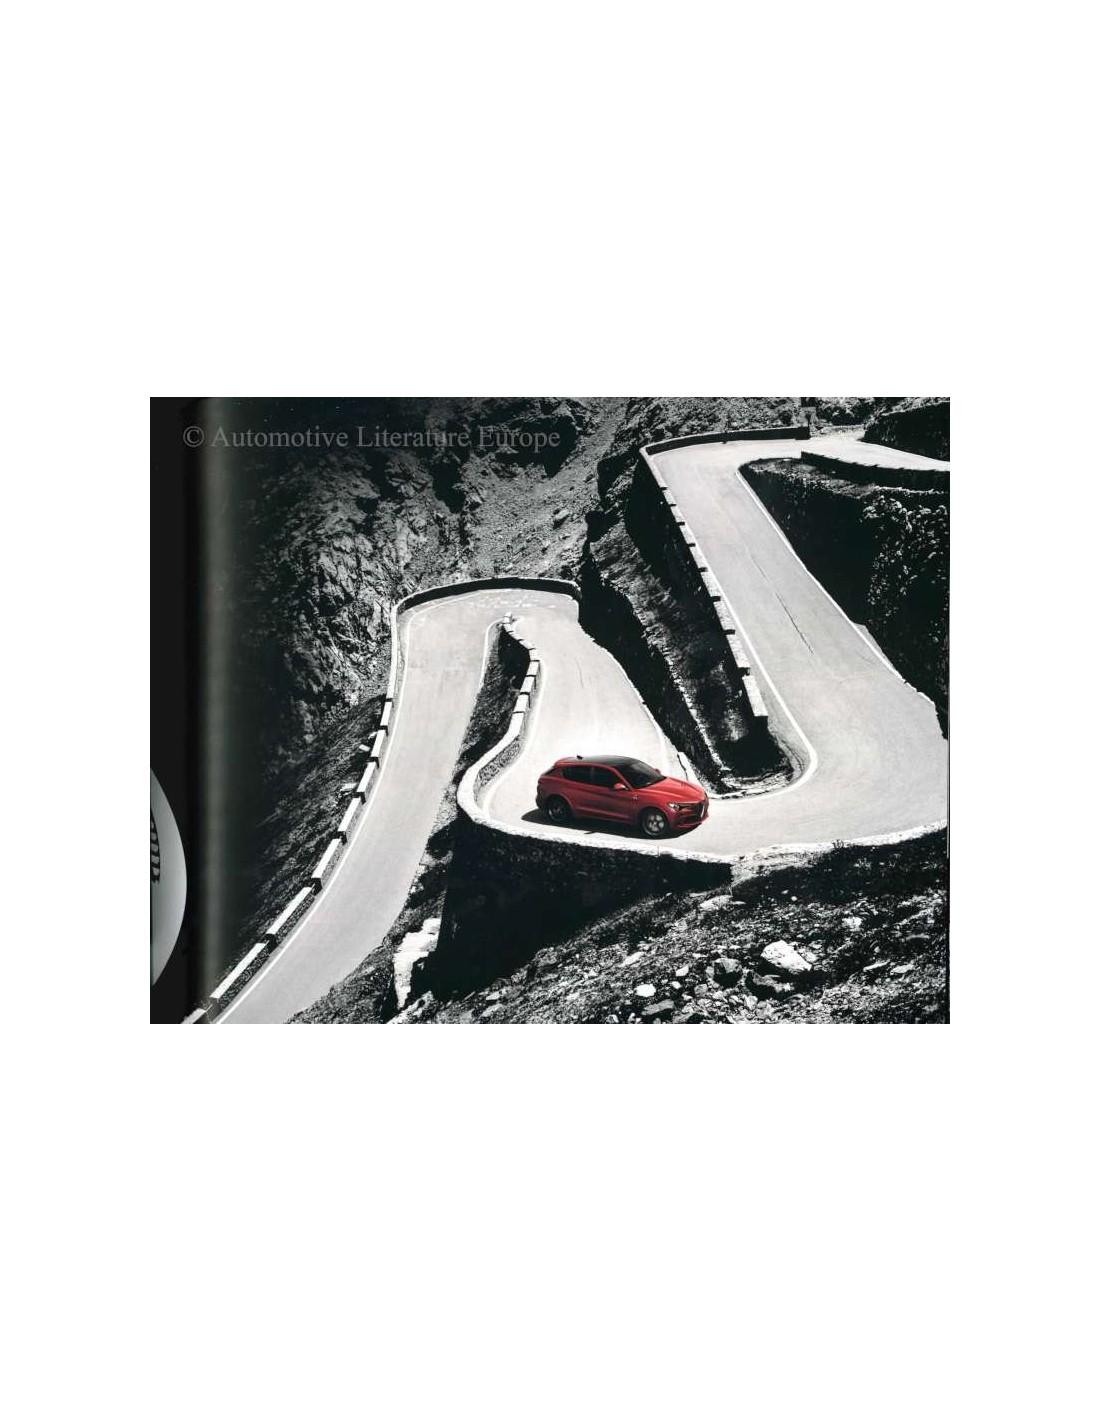 2018 ALFA ROMEO STELVIO QUADRIFOGLIO BROCHURE FRENCH Alfa Romeo Stelvio Brochure on alpha romeo, uggs on sale men's romeo, marseille romeo, things that describe romeo, ver videos de romeo, alpine romeo, giulietta and romeo,